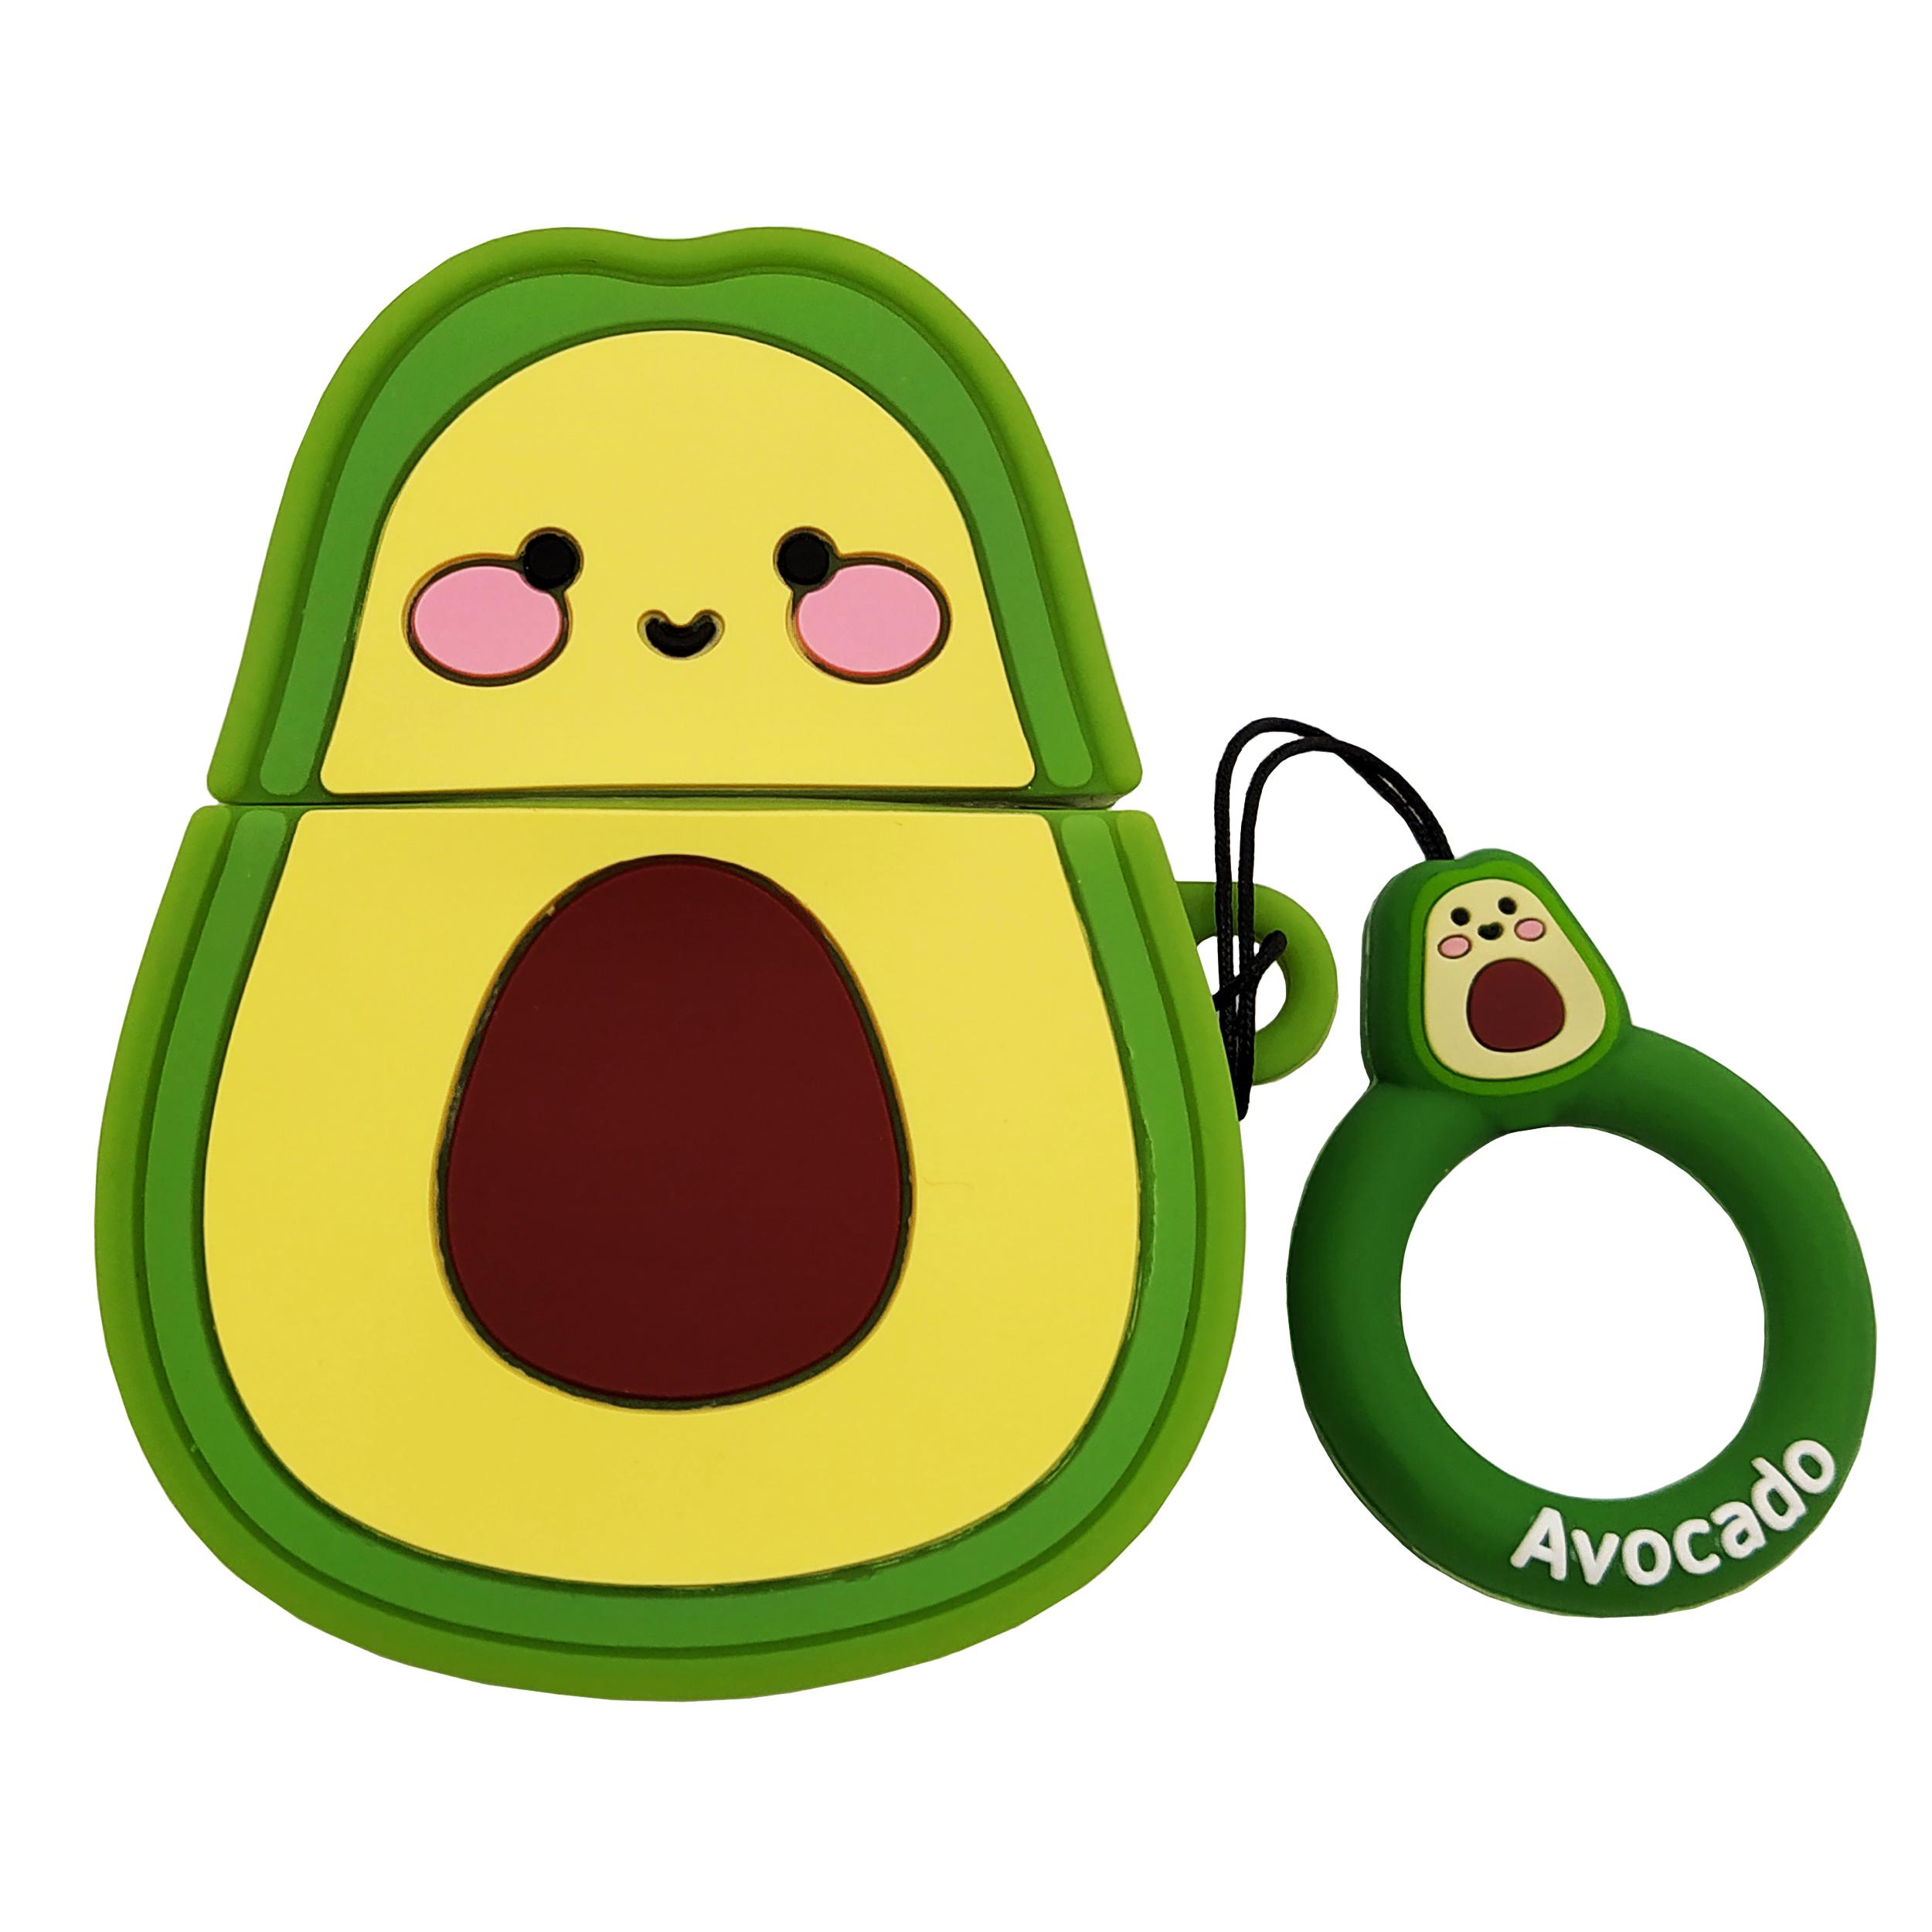 کاور طرح Avocado کد 001 مناسب برای کیس اپل ایرپاد